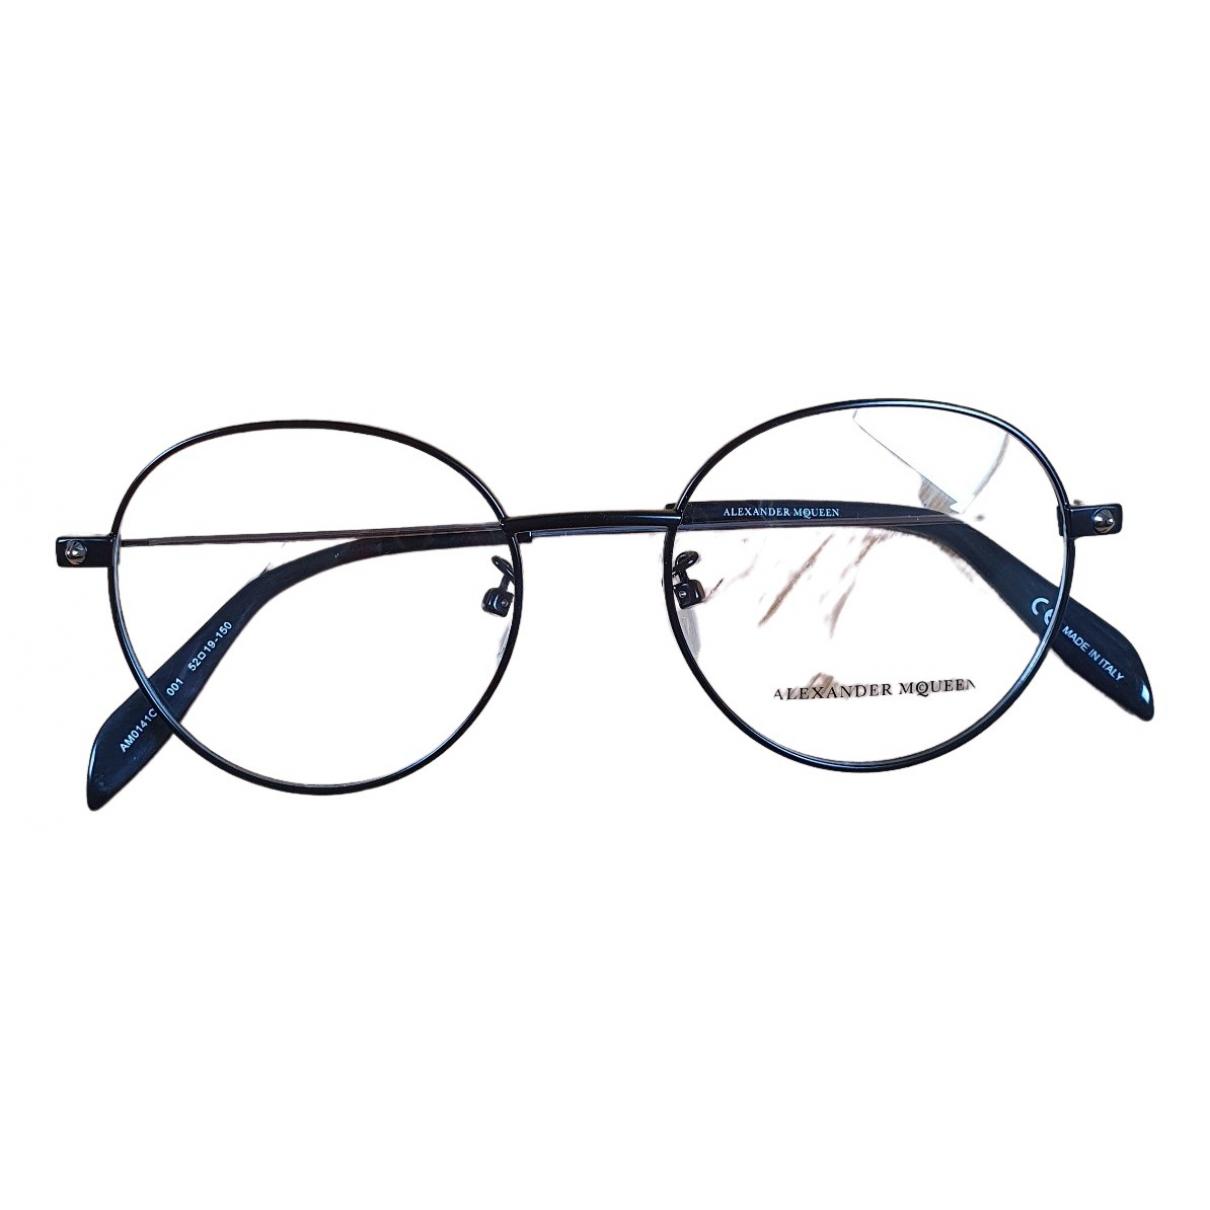 Alexander Mcqueen \N Sonnenbrillen in  Schwarz Kunststoff